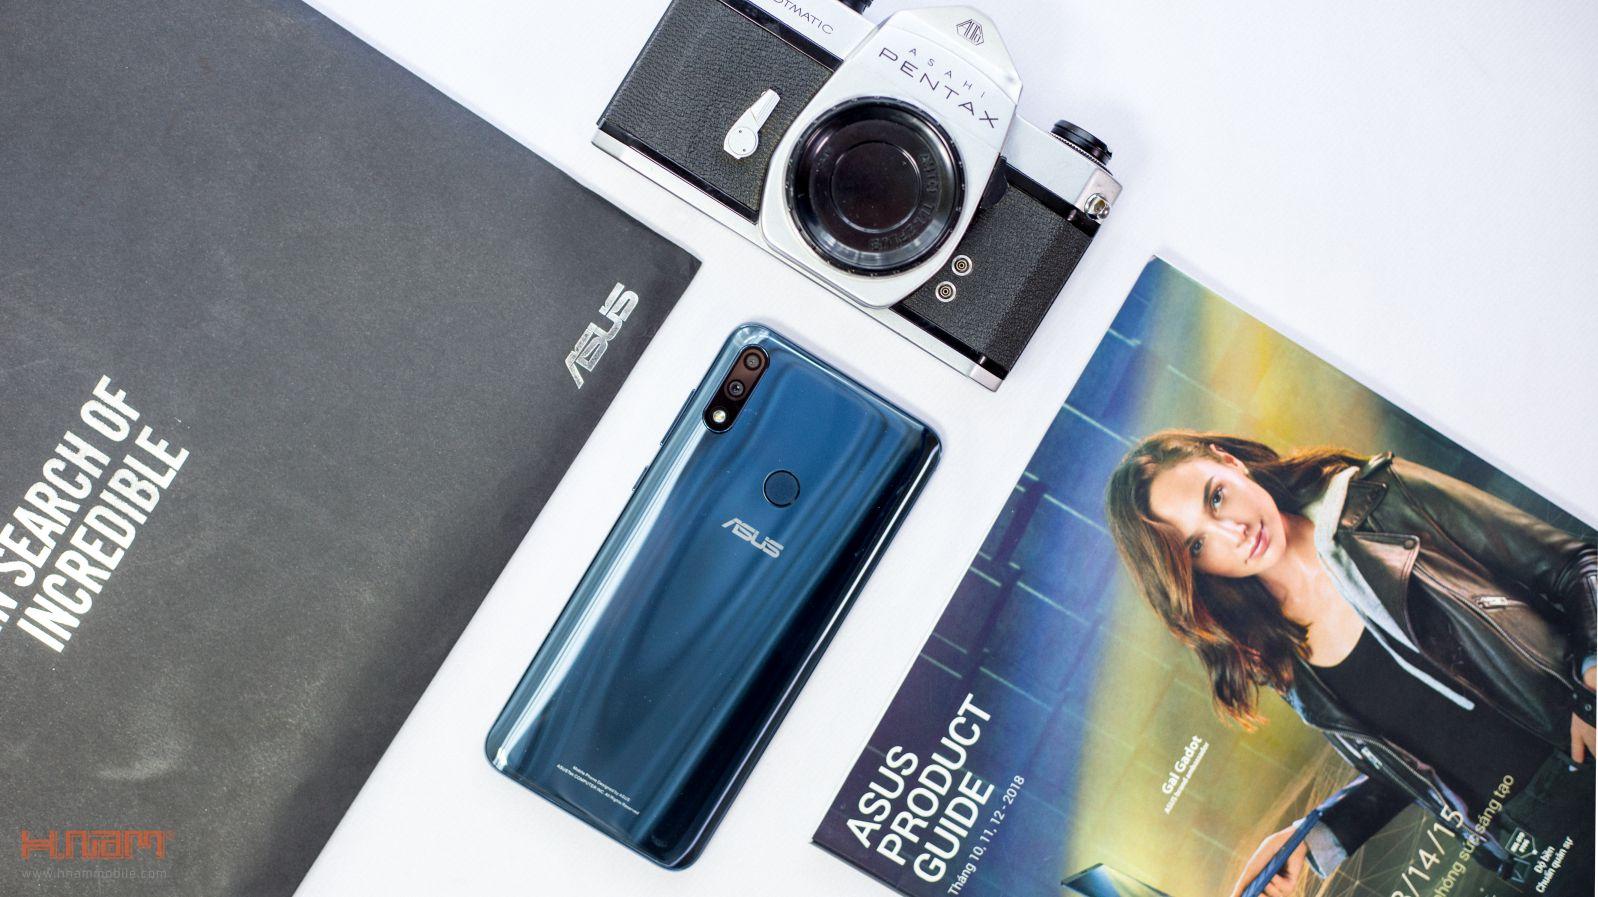 Trên tay Zenfone Max Pro M2: Snapdragon 660, pin 5000mAh, 5.29 triệu hình 15